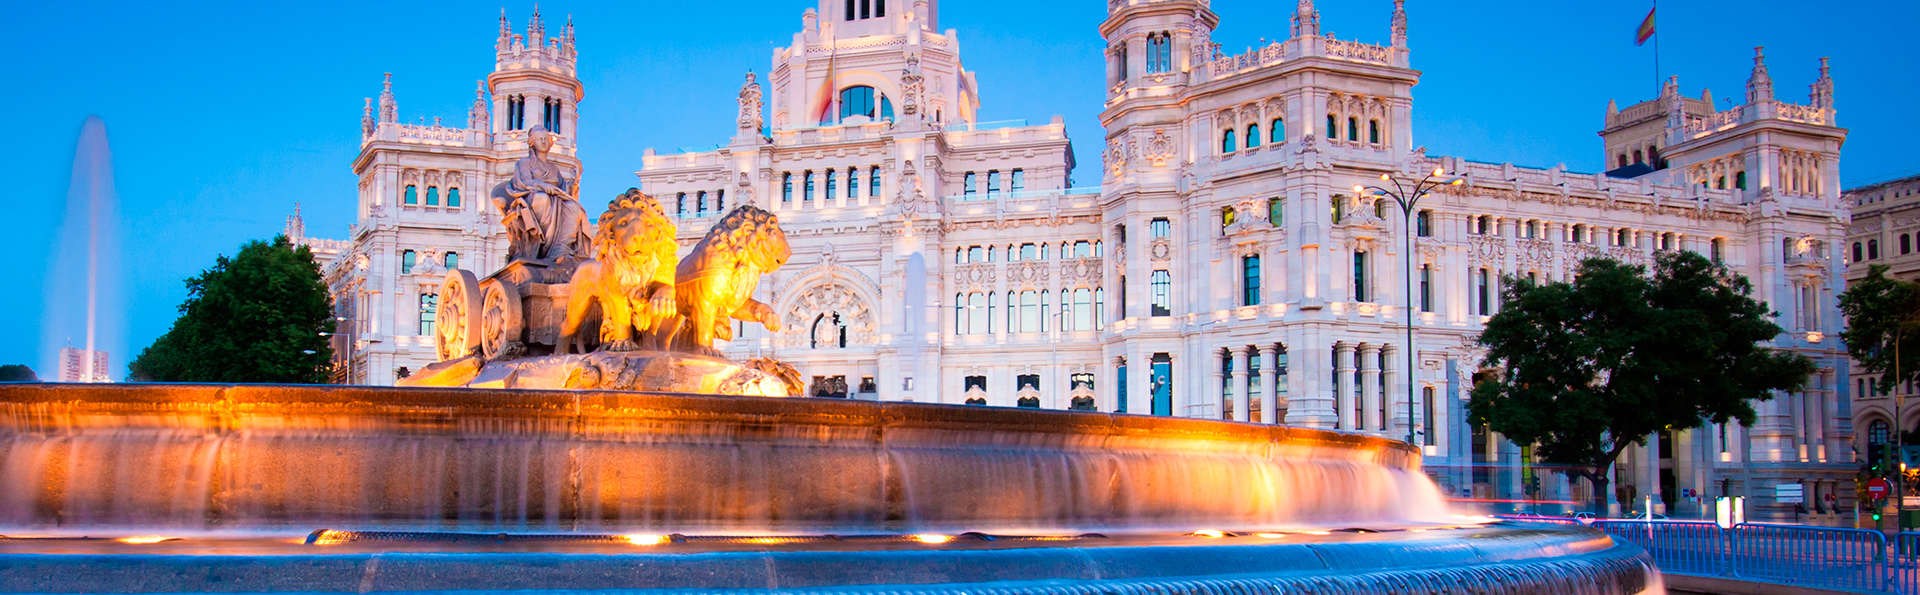 Hotel Zenit Conde de Orgaz - EDIT_destination1.jpg